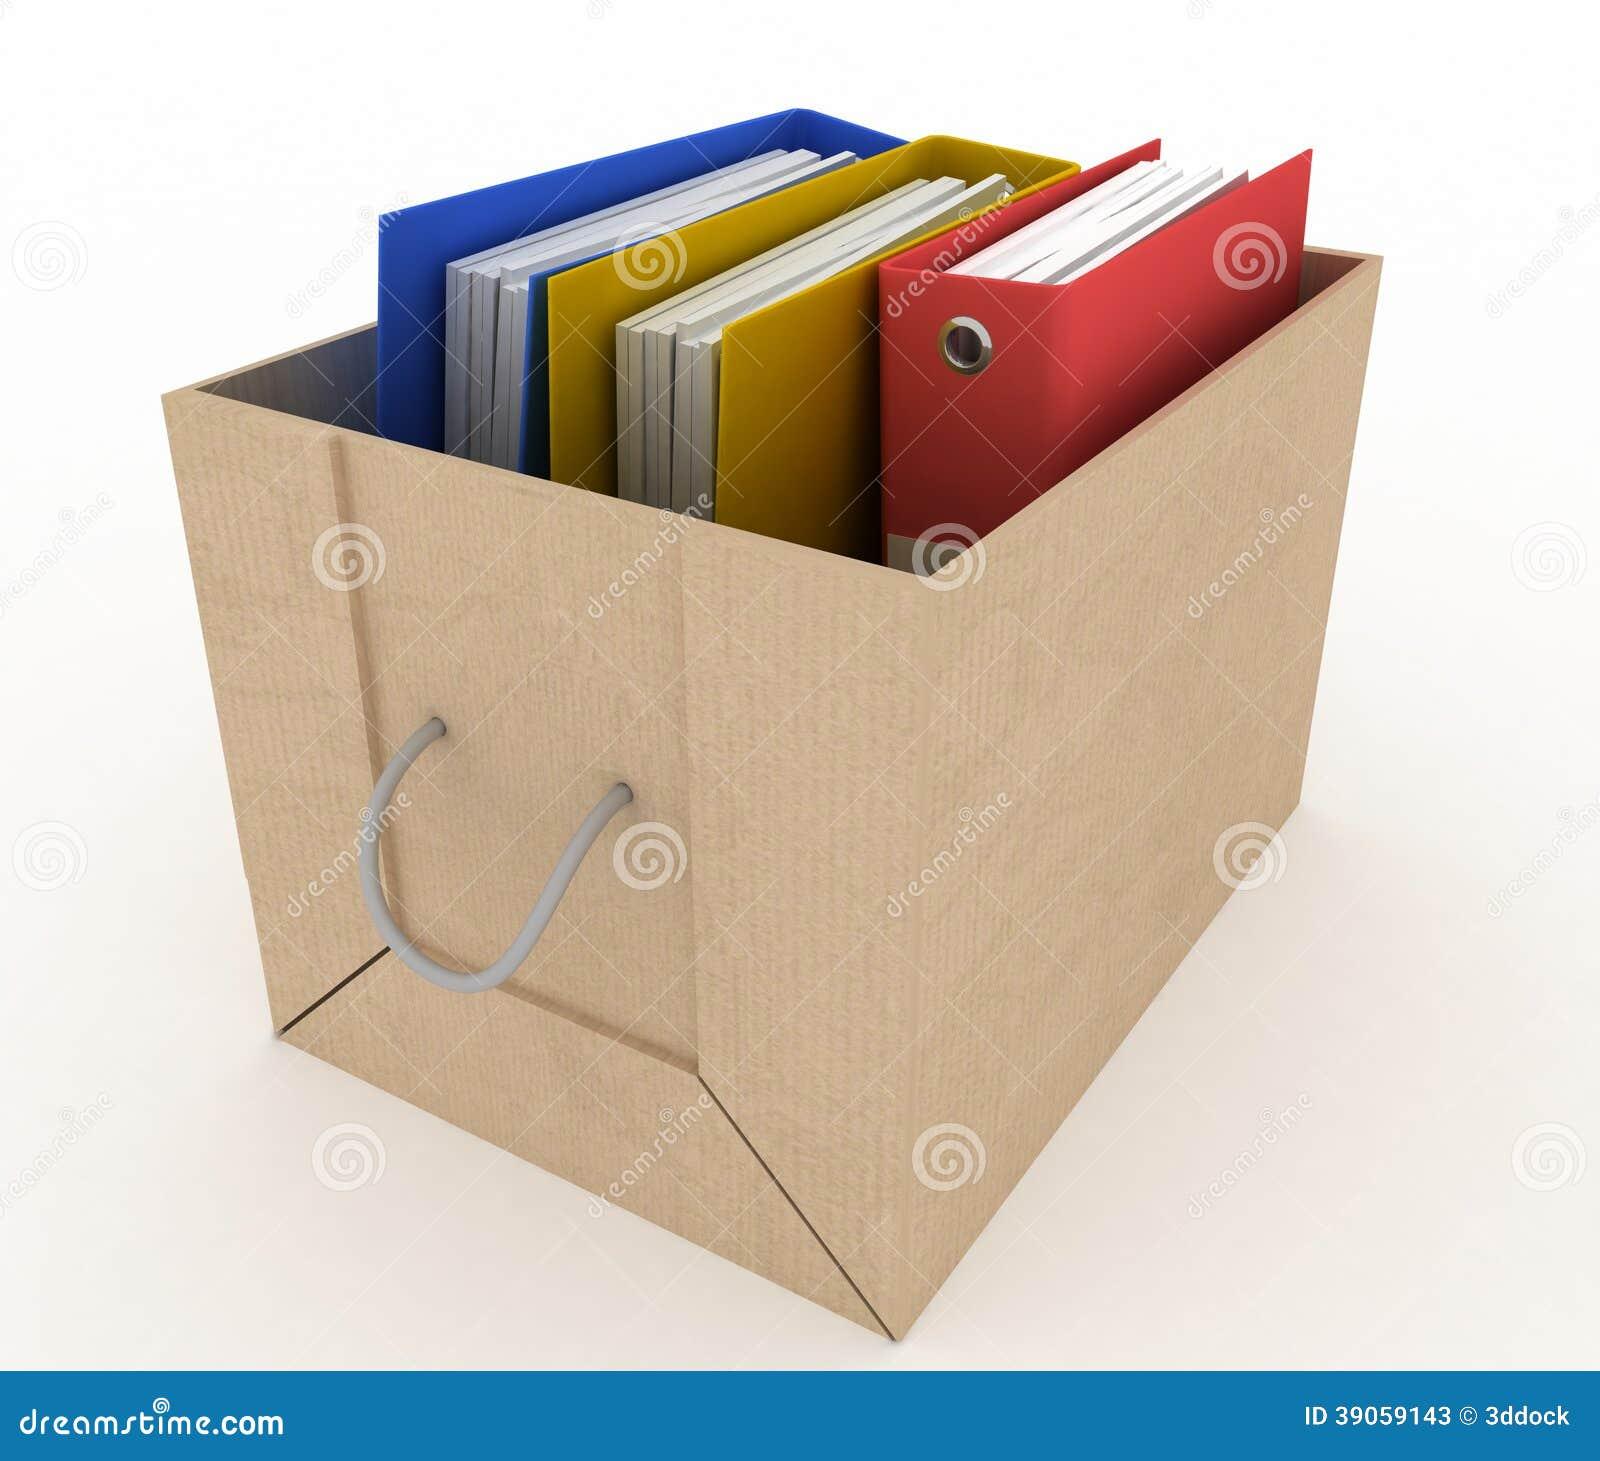 Office Folders In Cardboard Box Stock Illustration - Illustration of